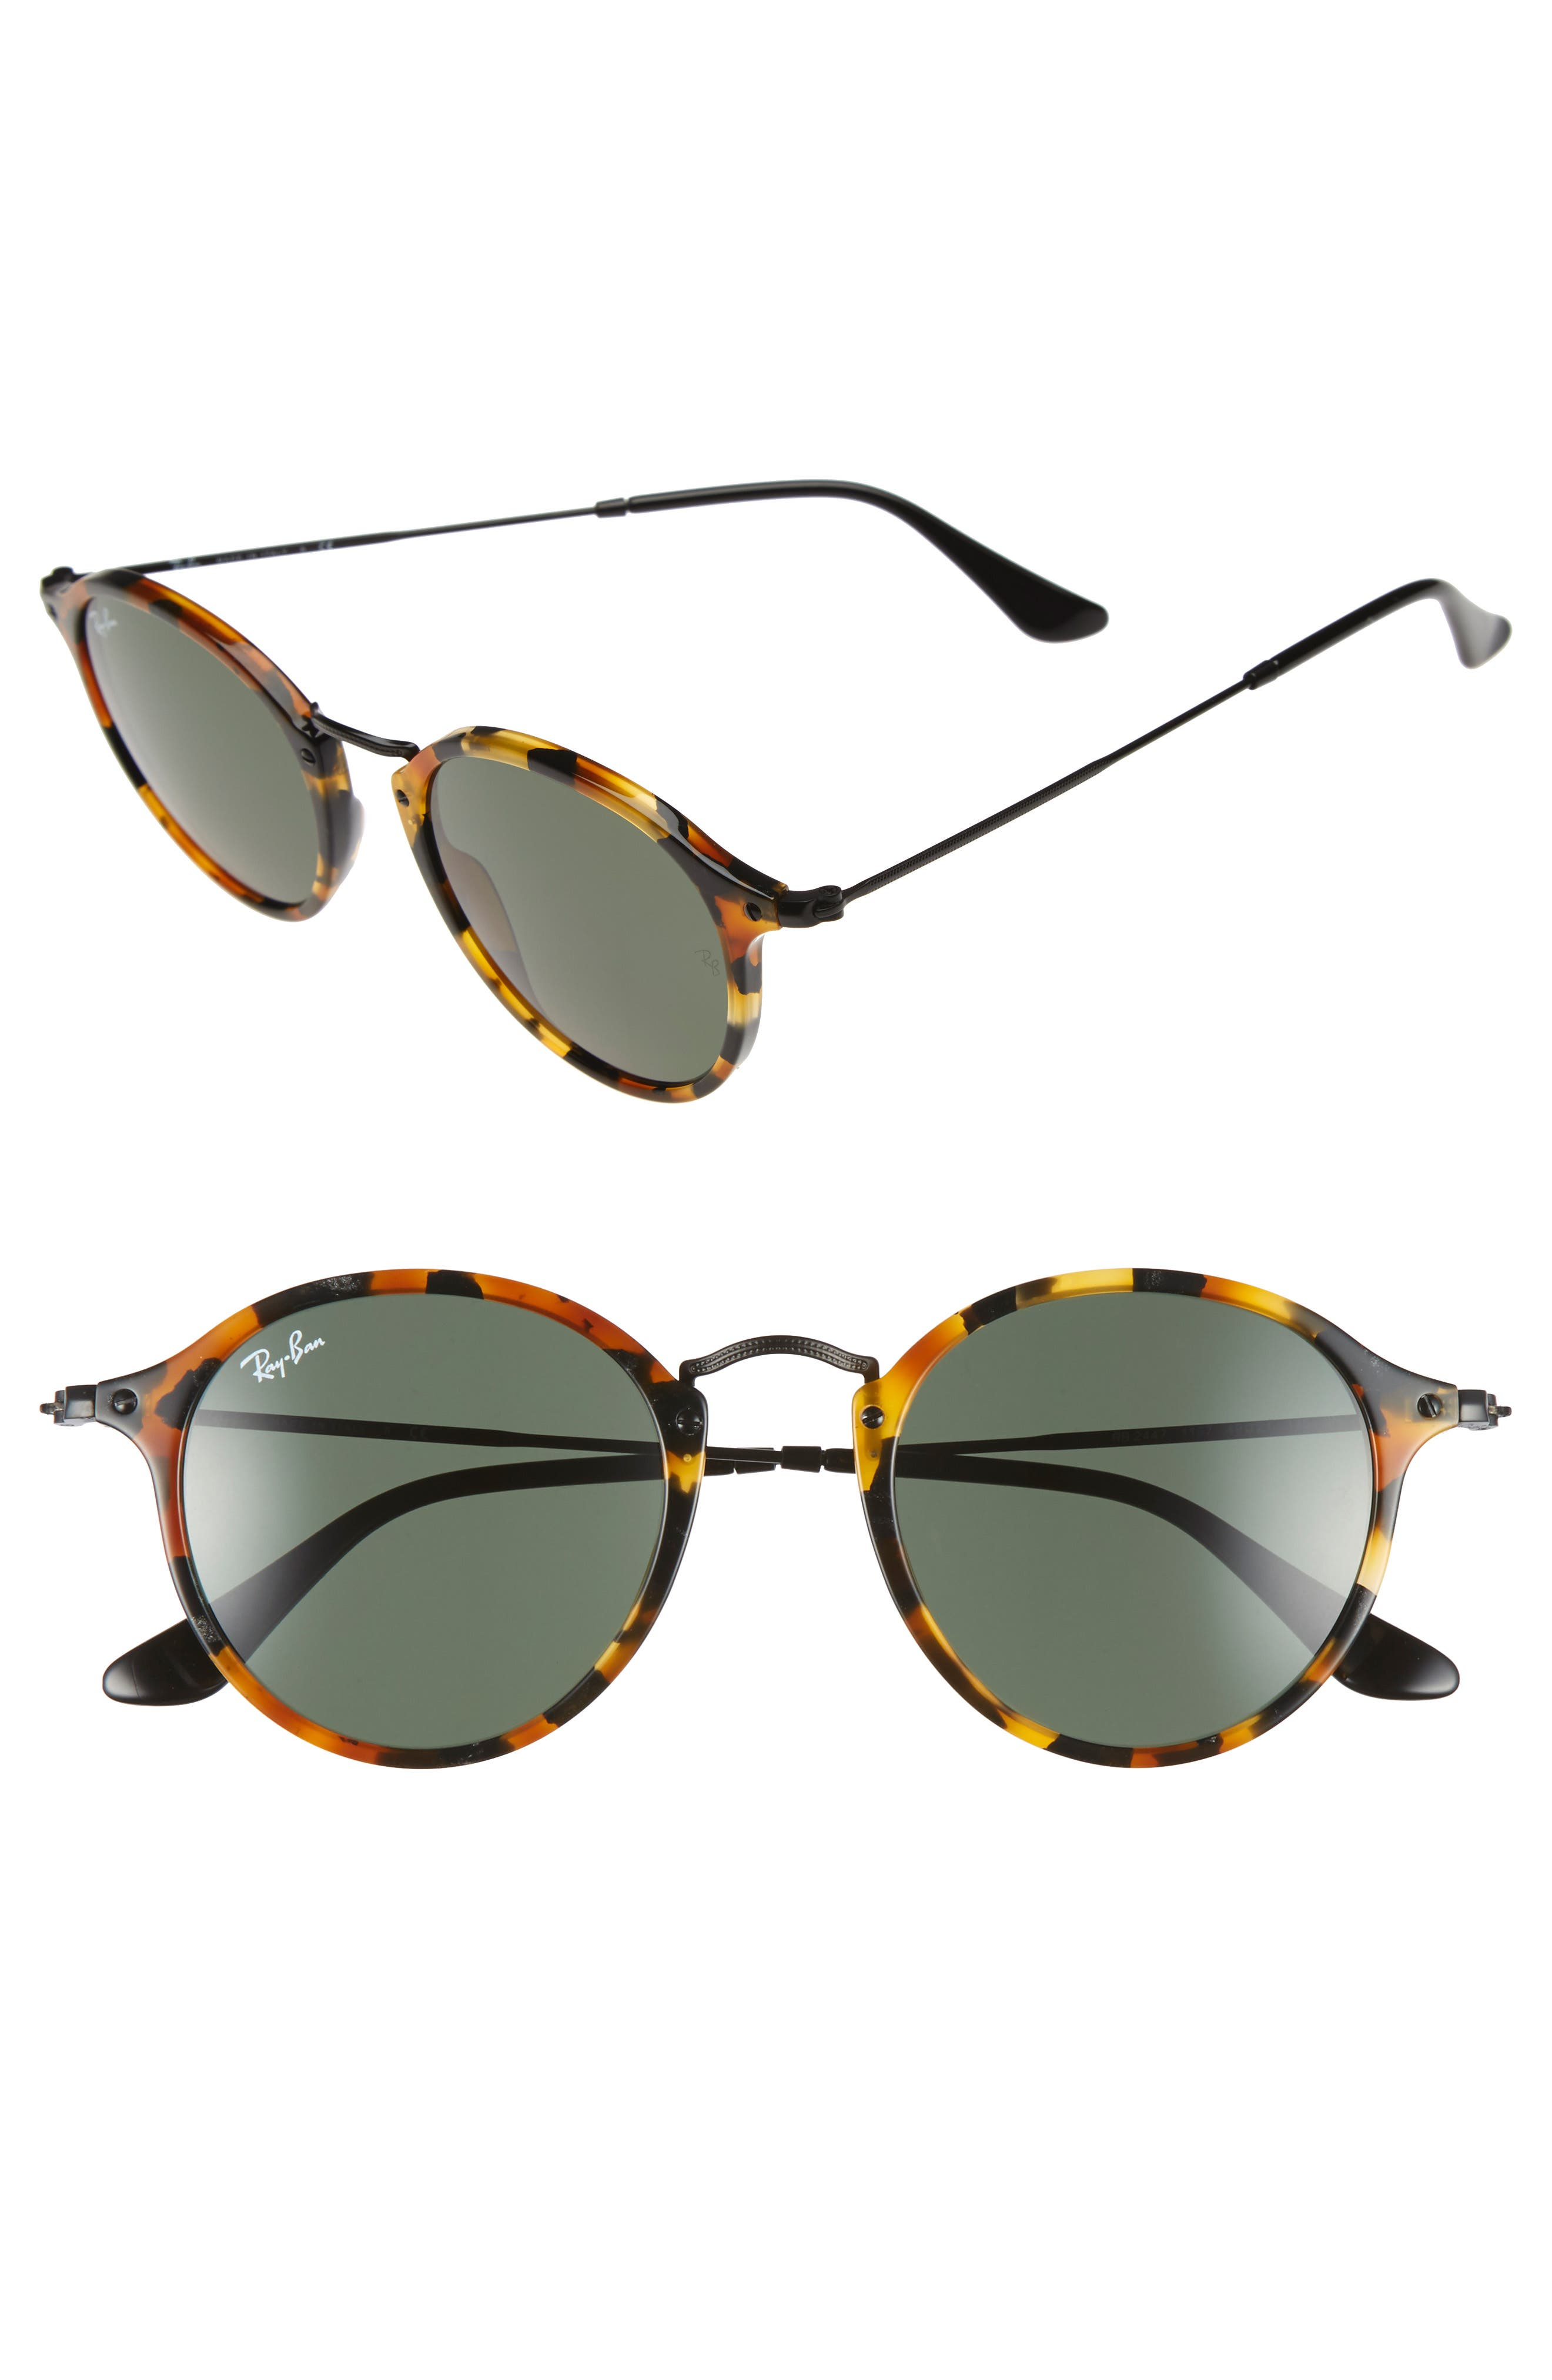 Ray-Ban 4m Retro Sunglasses - Spotted Black Havana/ Green